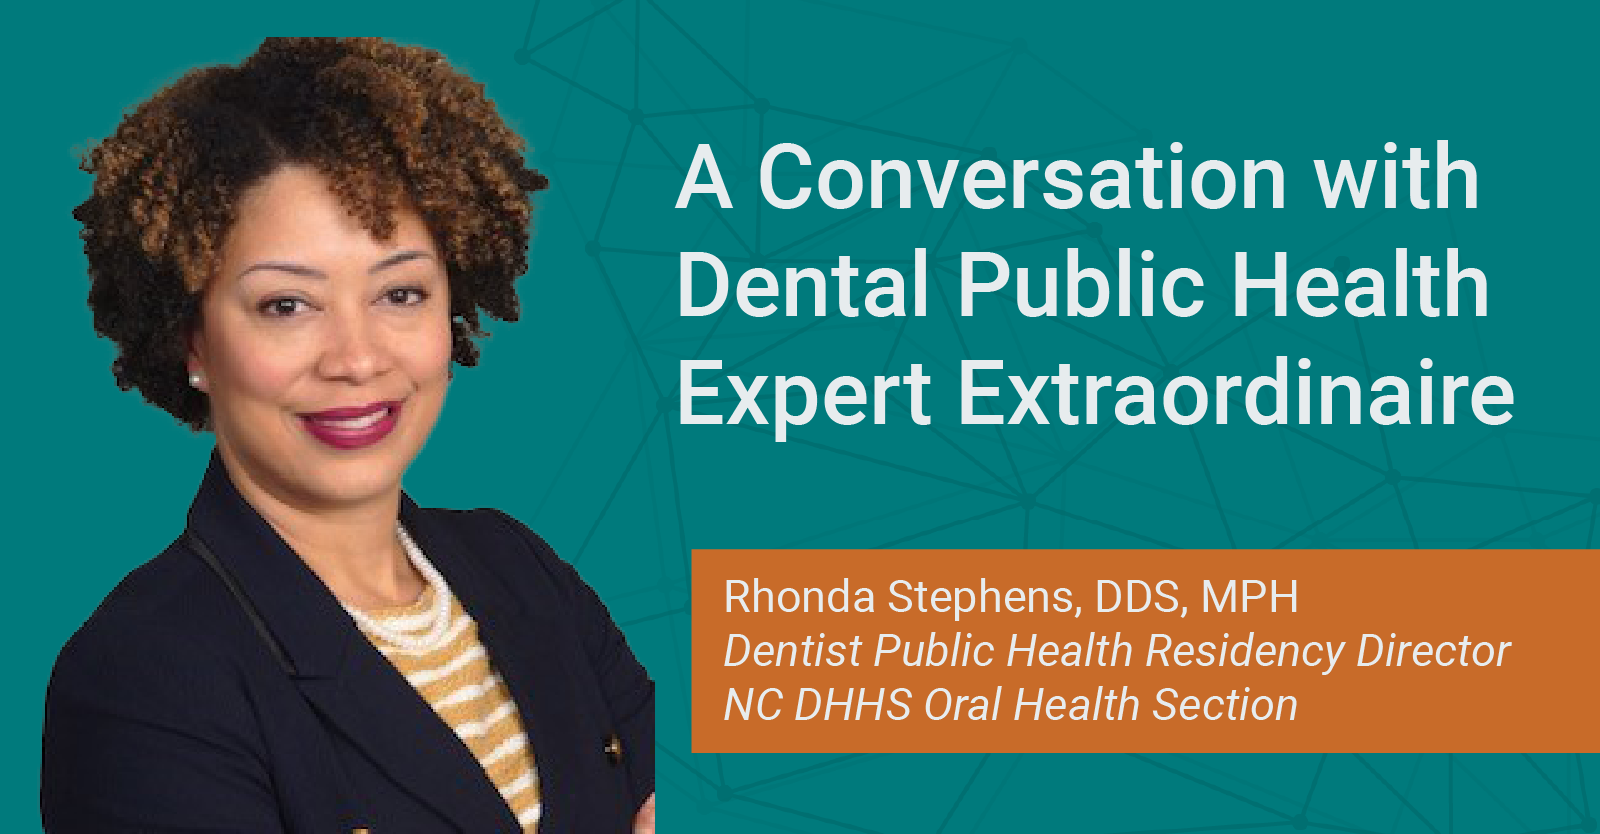 A Conversation with Public Health Expert Extraordinaire, Dr. Rhonda Stephens